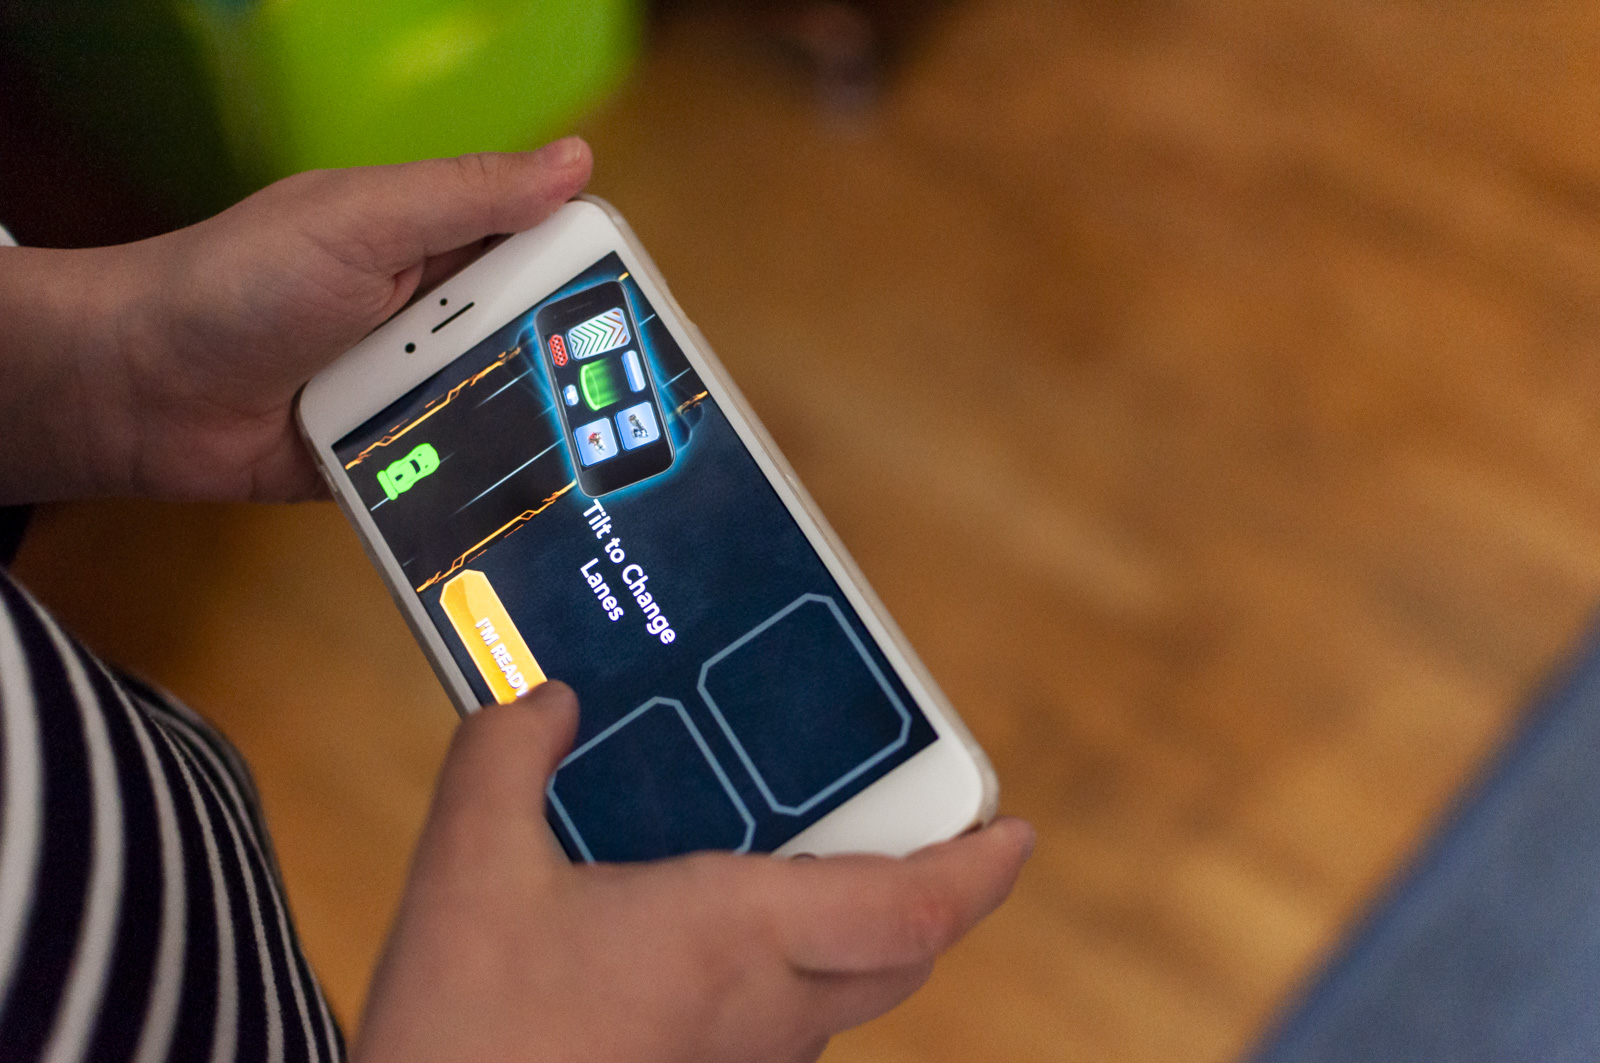 Recensione Anki Overdrive, macchinine radiocomandate a portata di iPhone